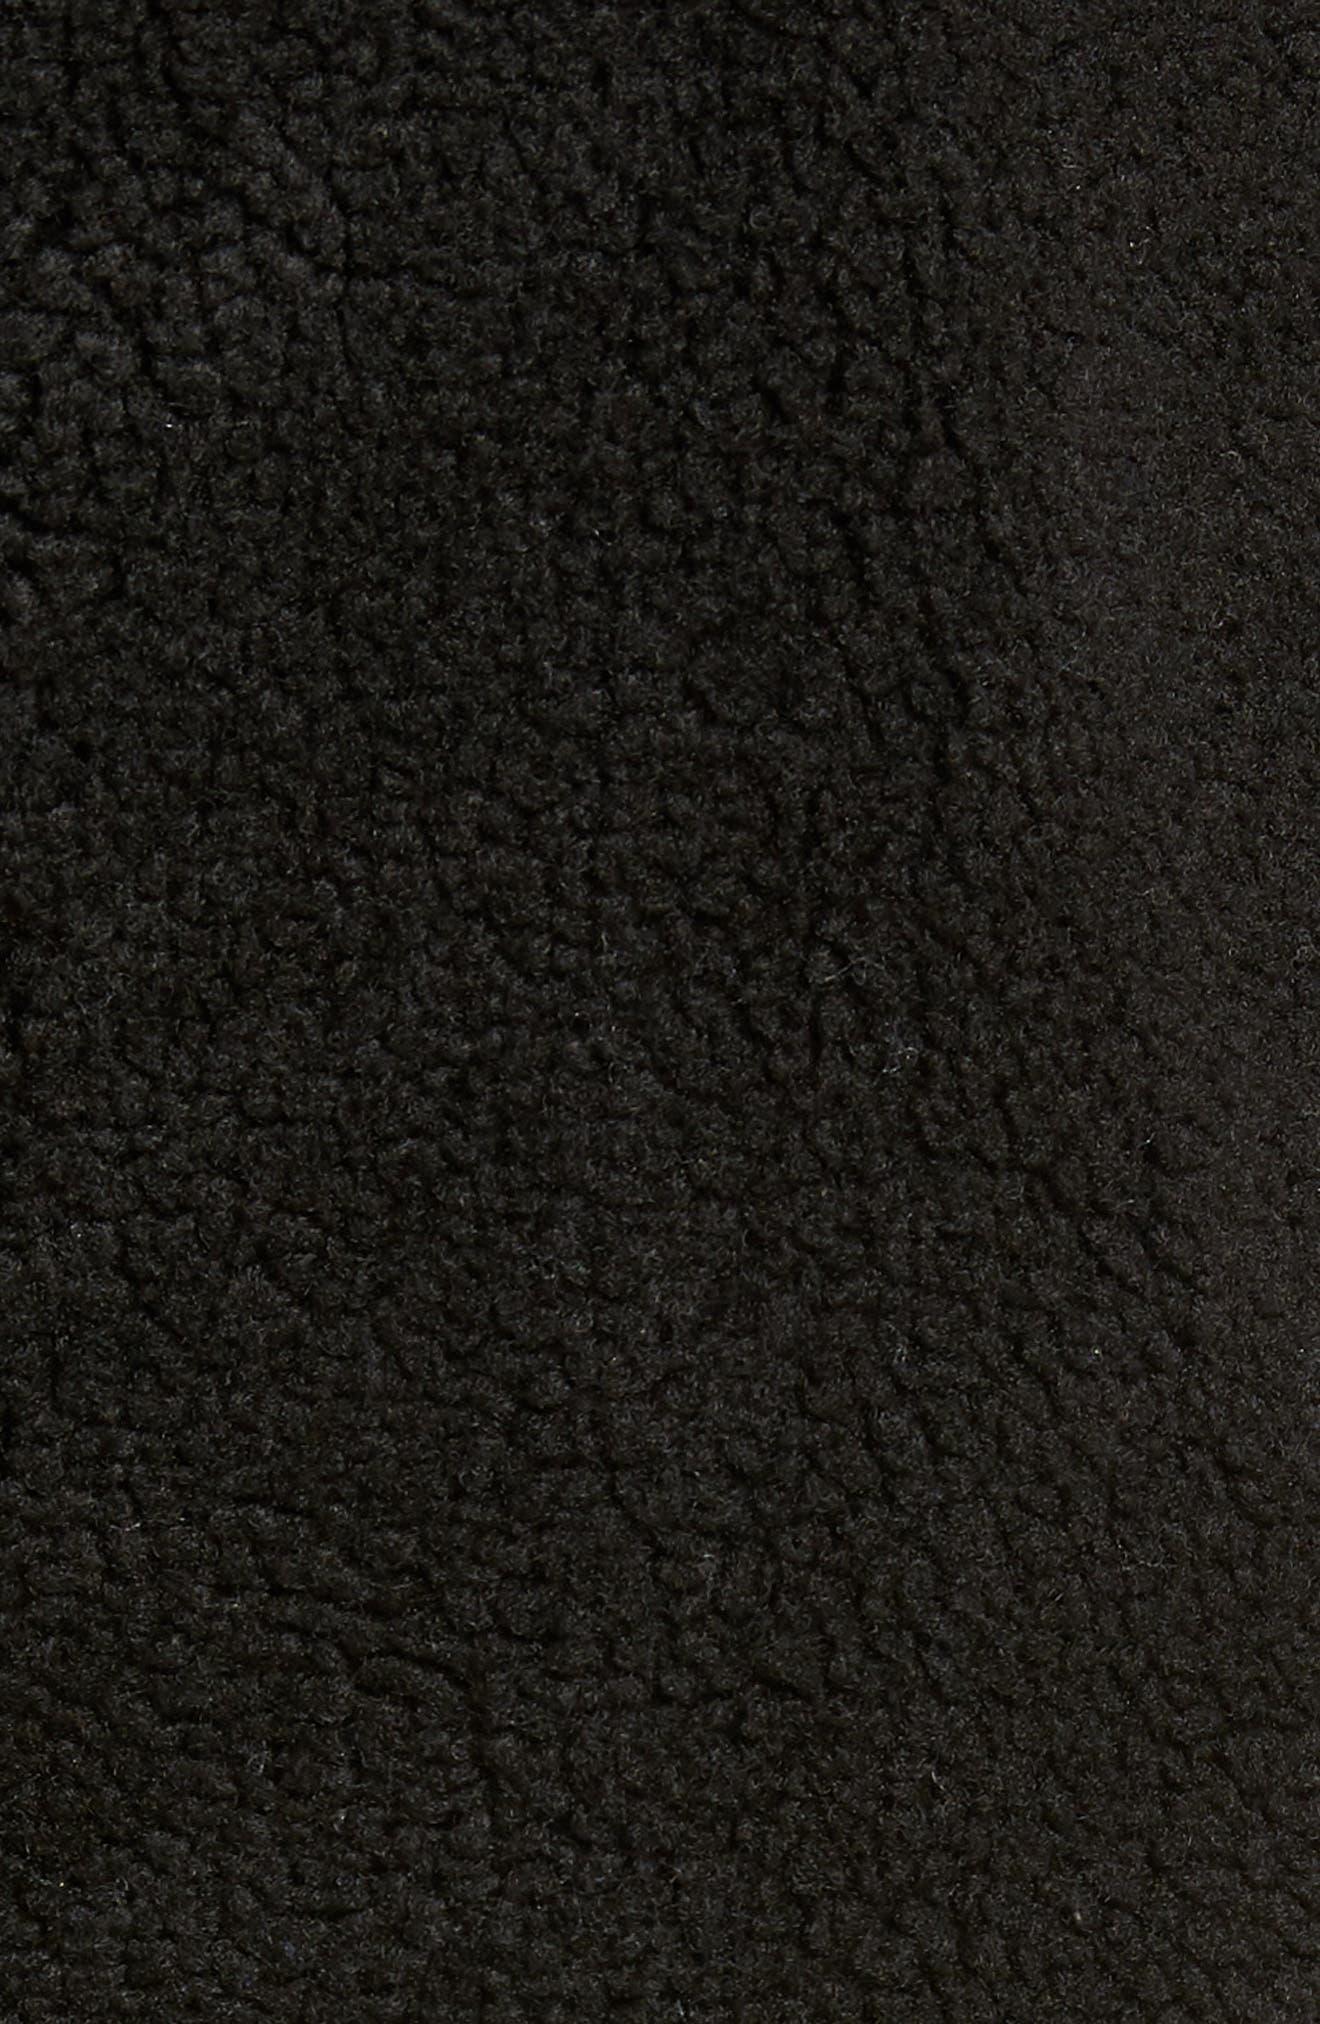 NIKE, Sportswear Tech Fleece Icon Jogger Pants, Alternate thumbnail 6, color, 010